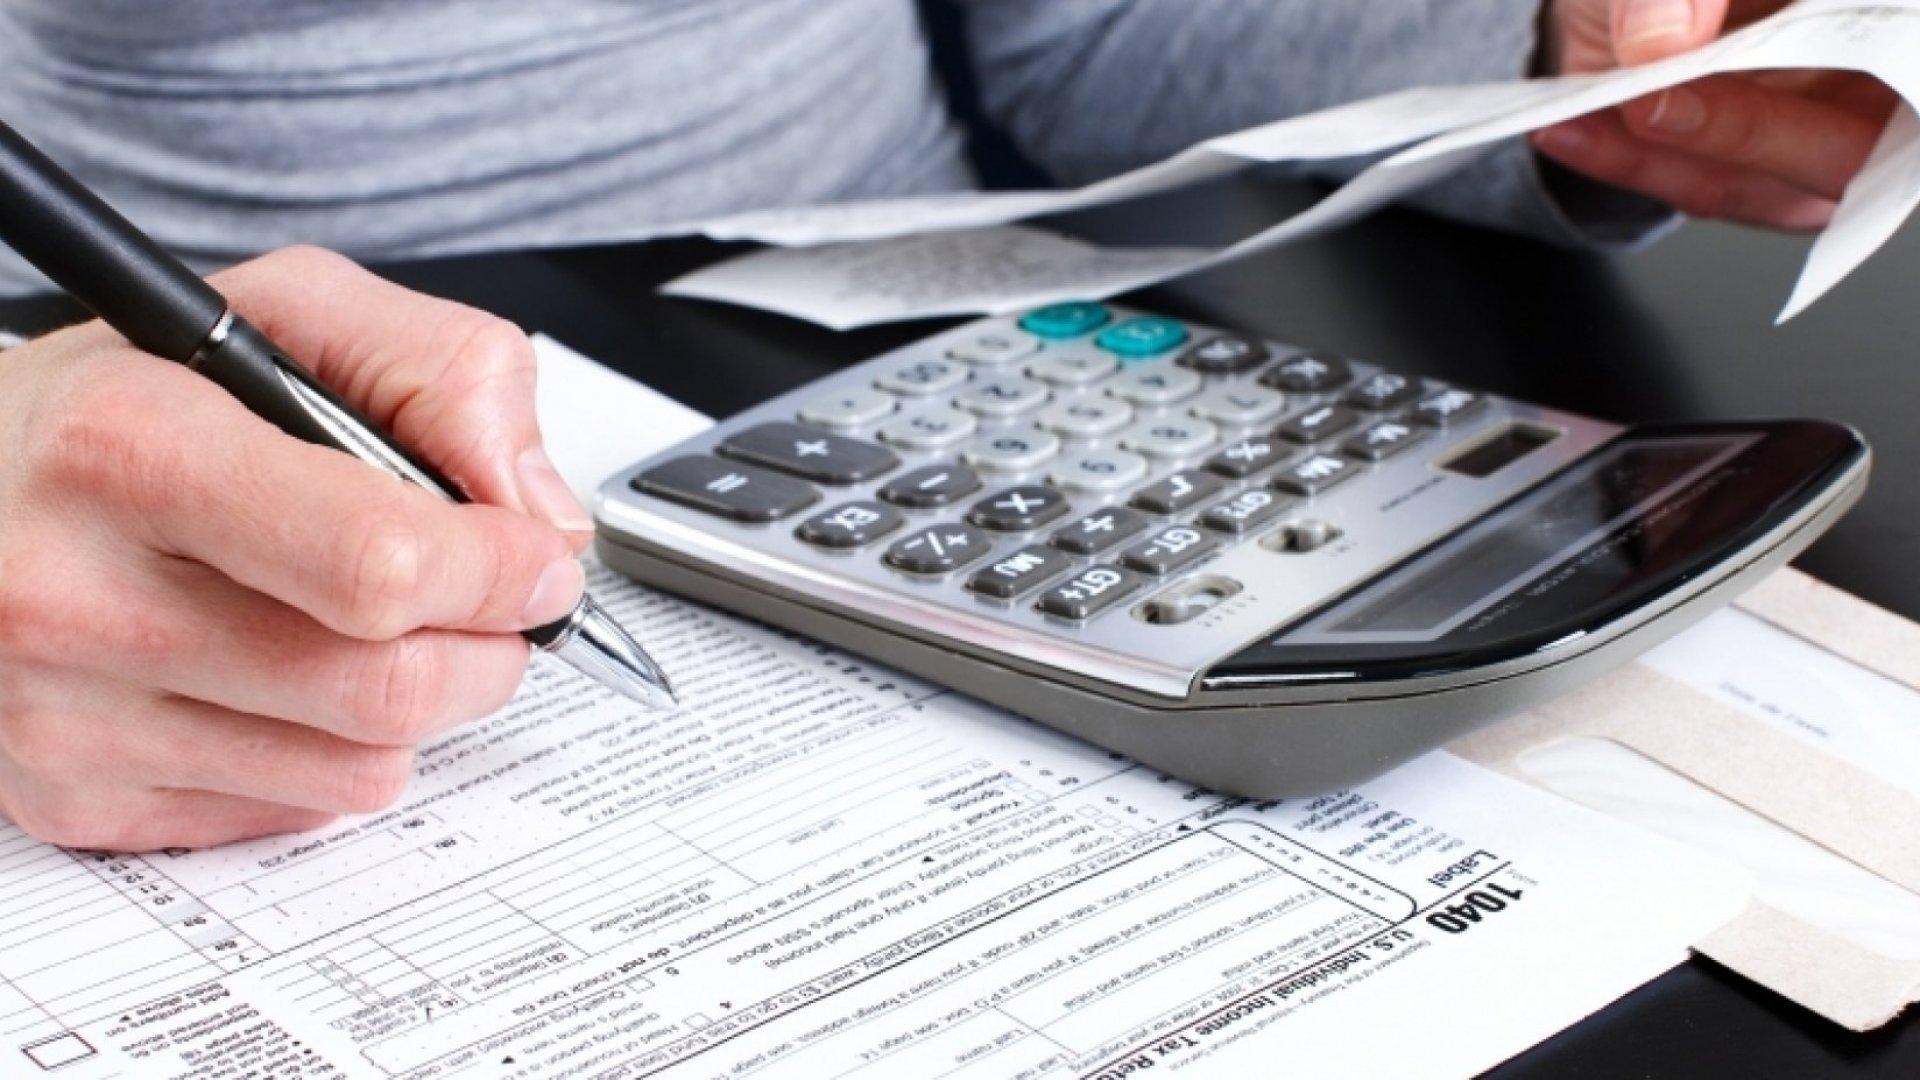 Good Financial Record Keeping Has Value Beyond Tax Season